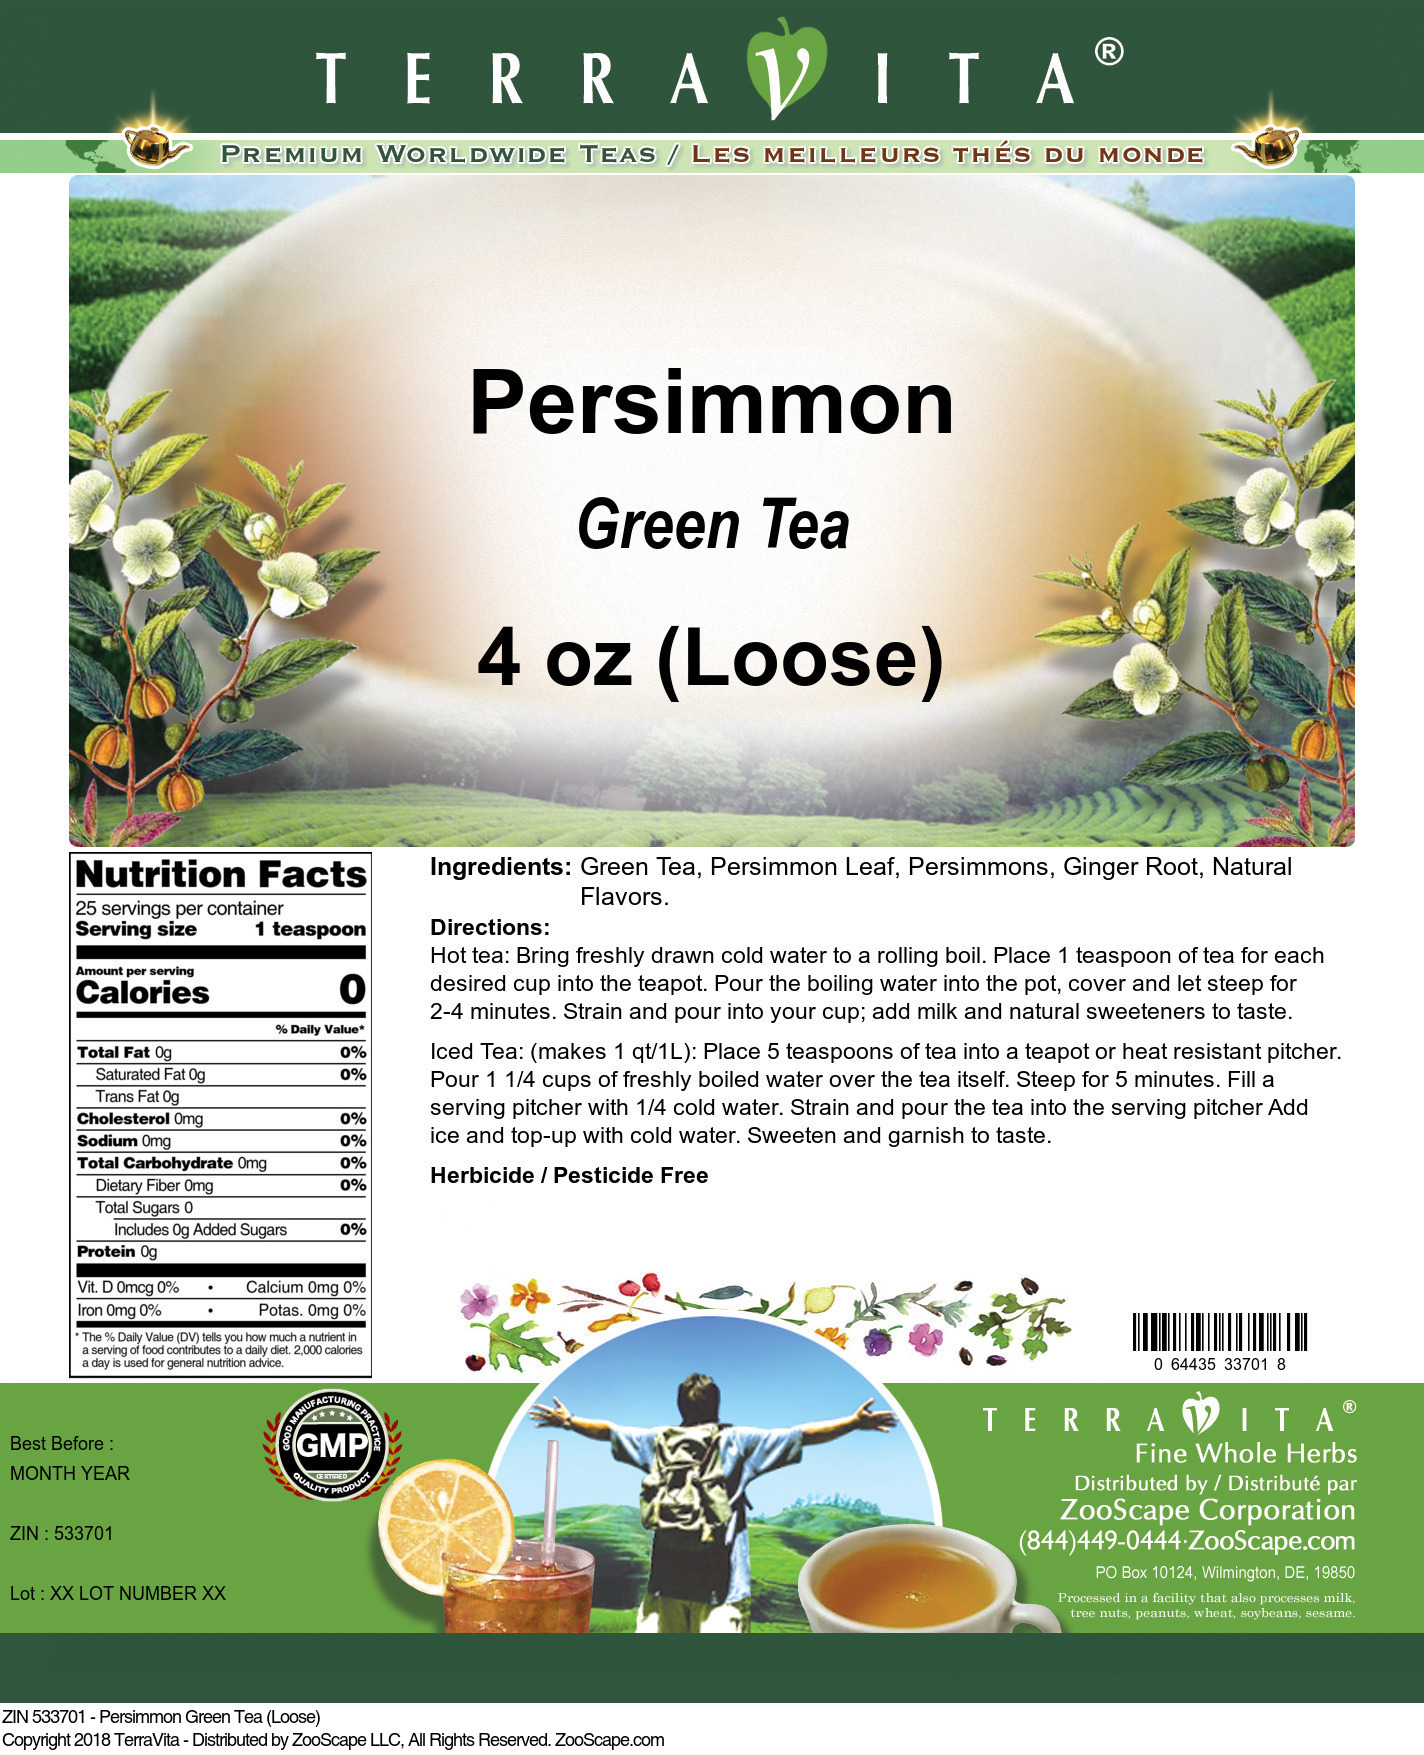 Persimmon Green Tea